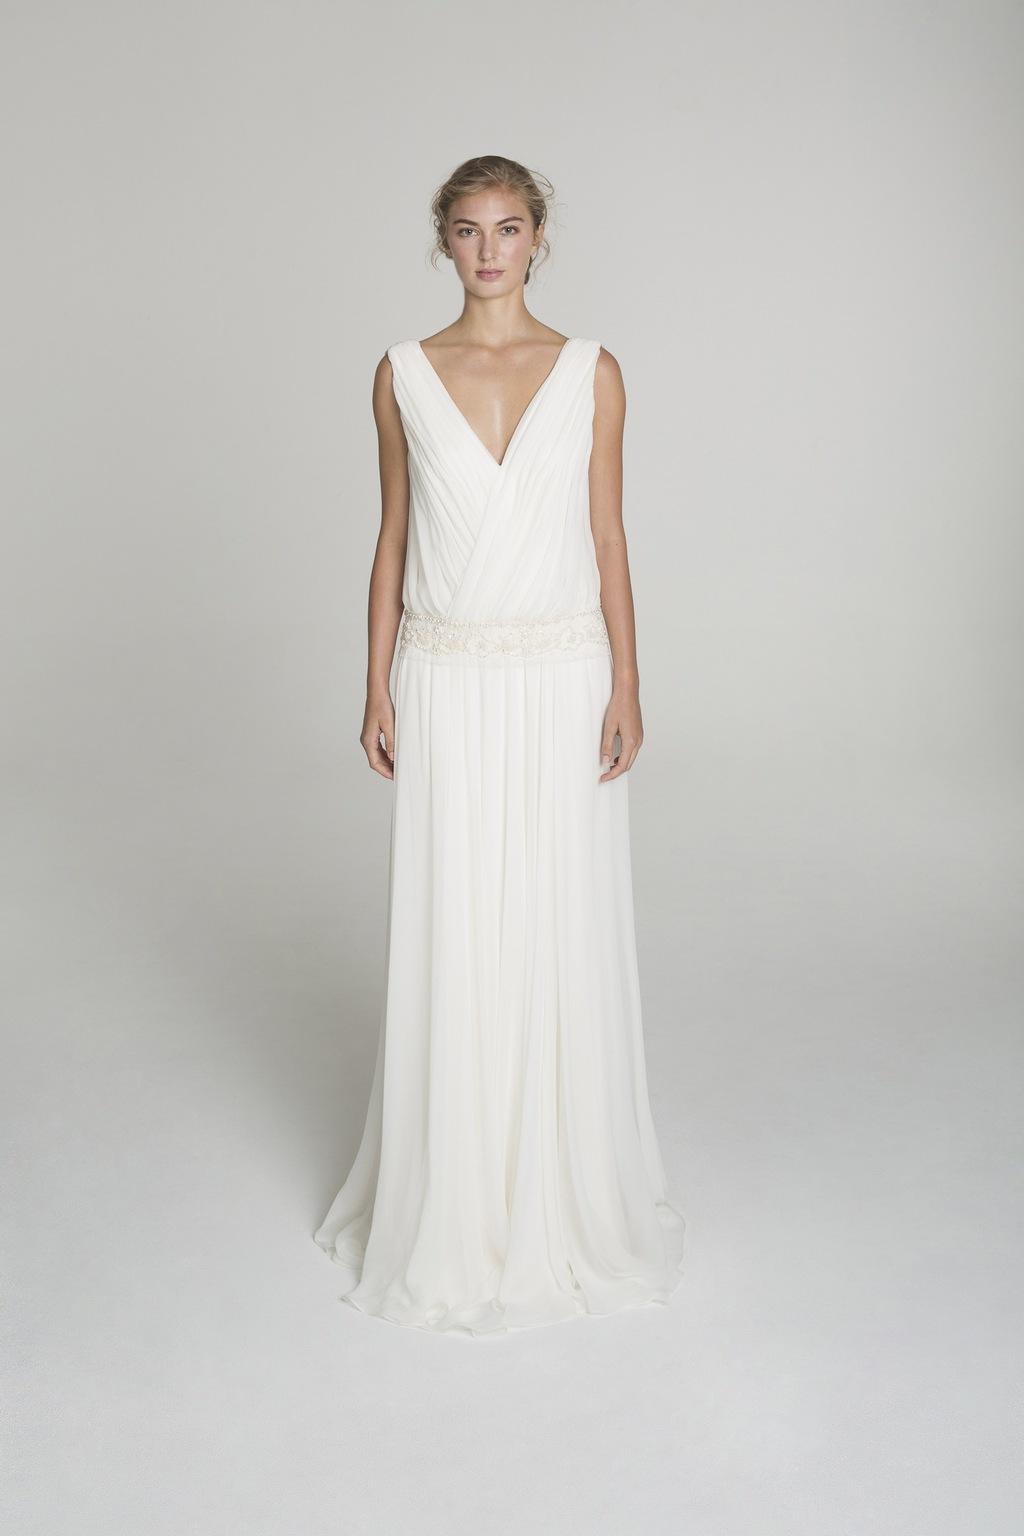 A-line_wedding_dress_from_alana_aoun.full